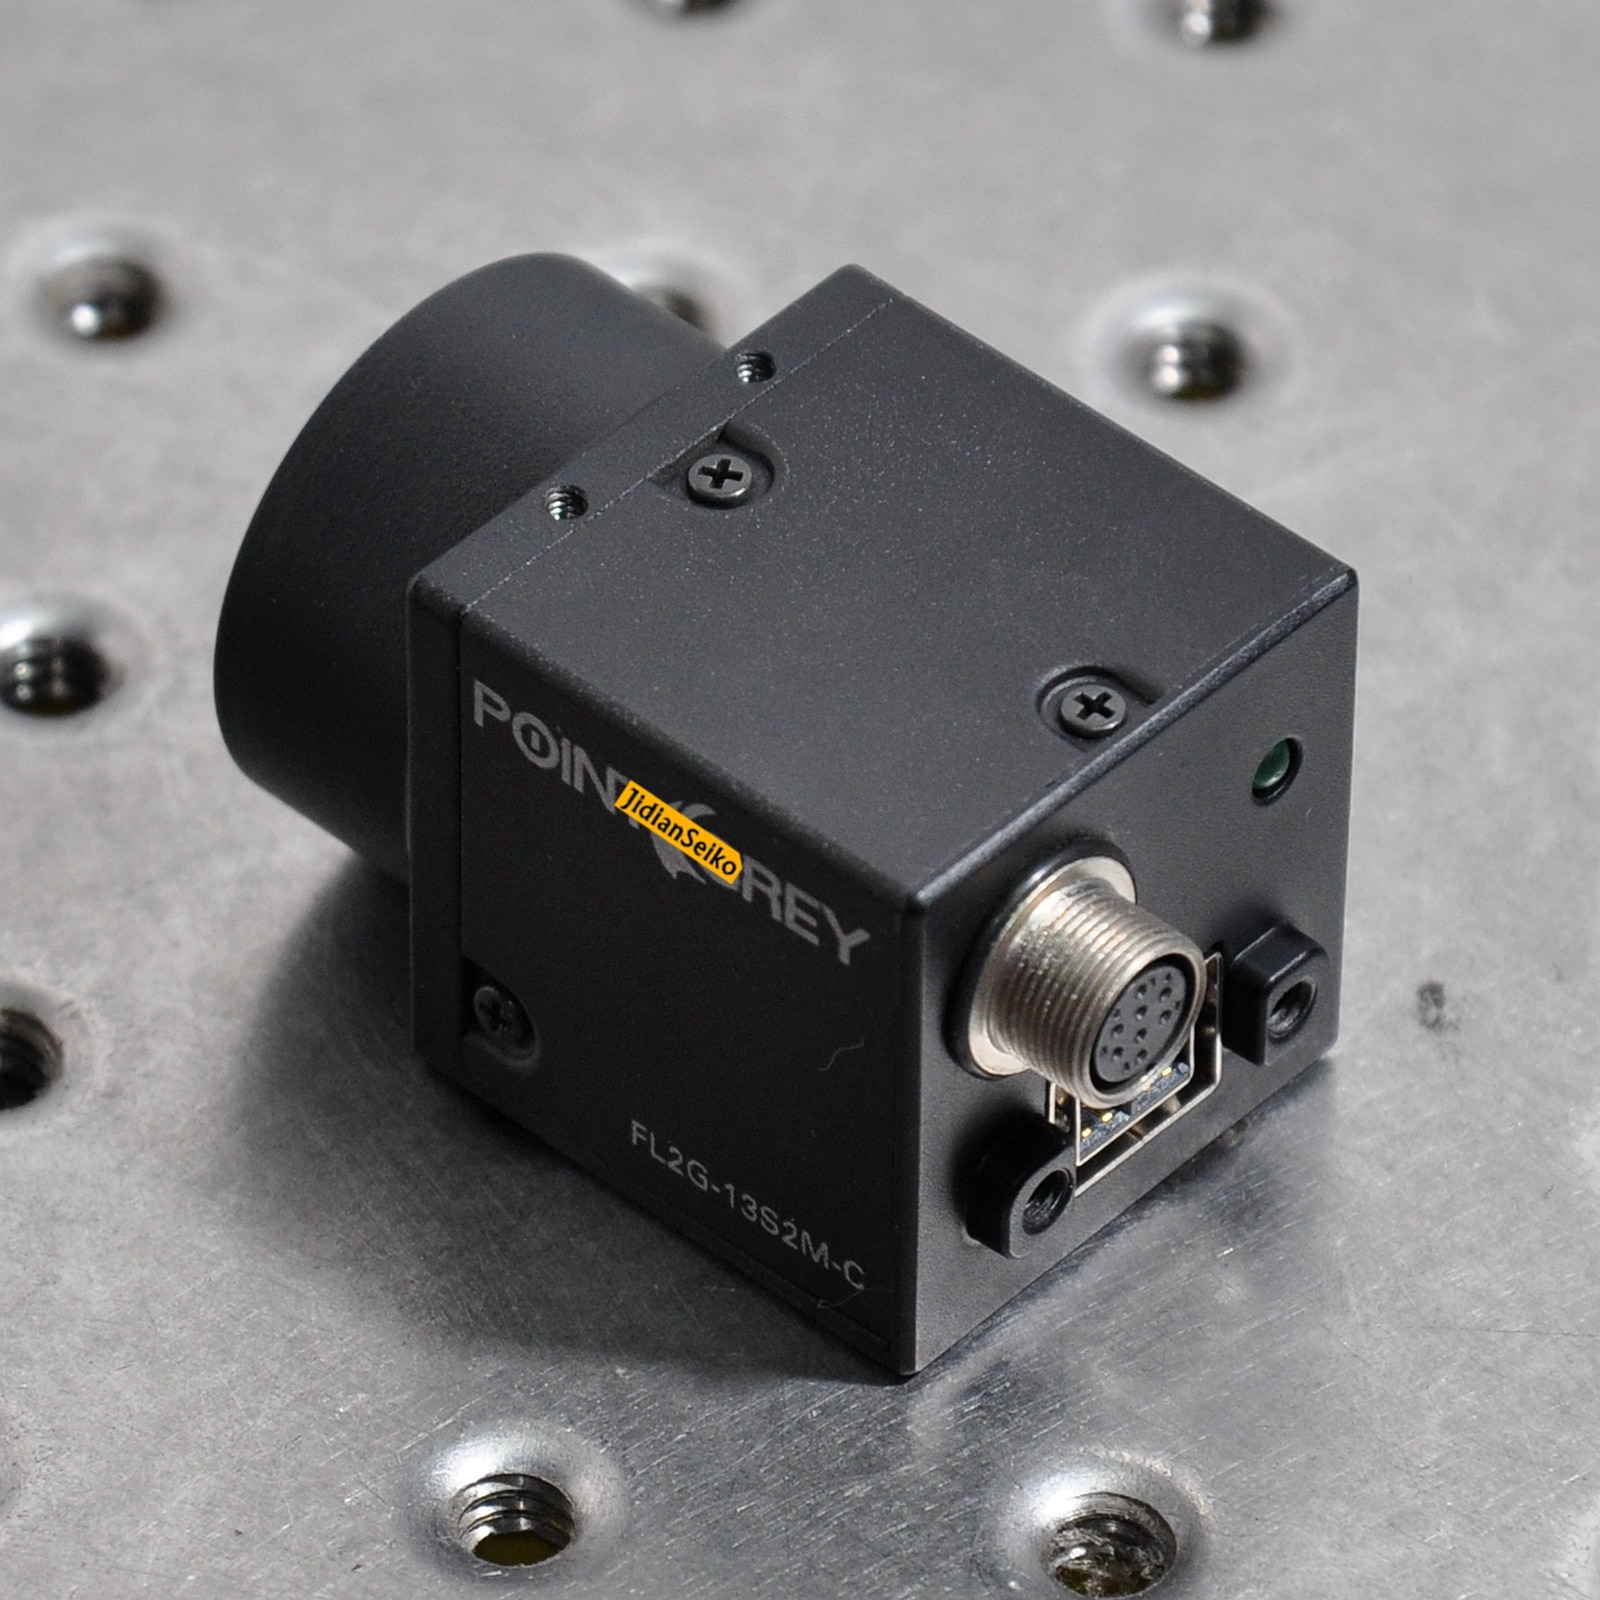 Canada FL2G-13S2M-C Industrial camera CCD camera enlarge